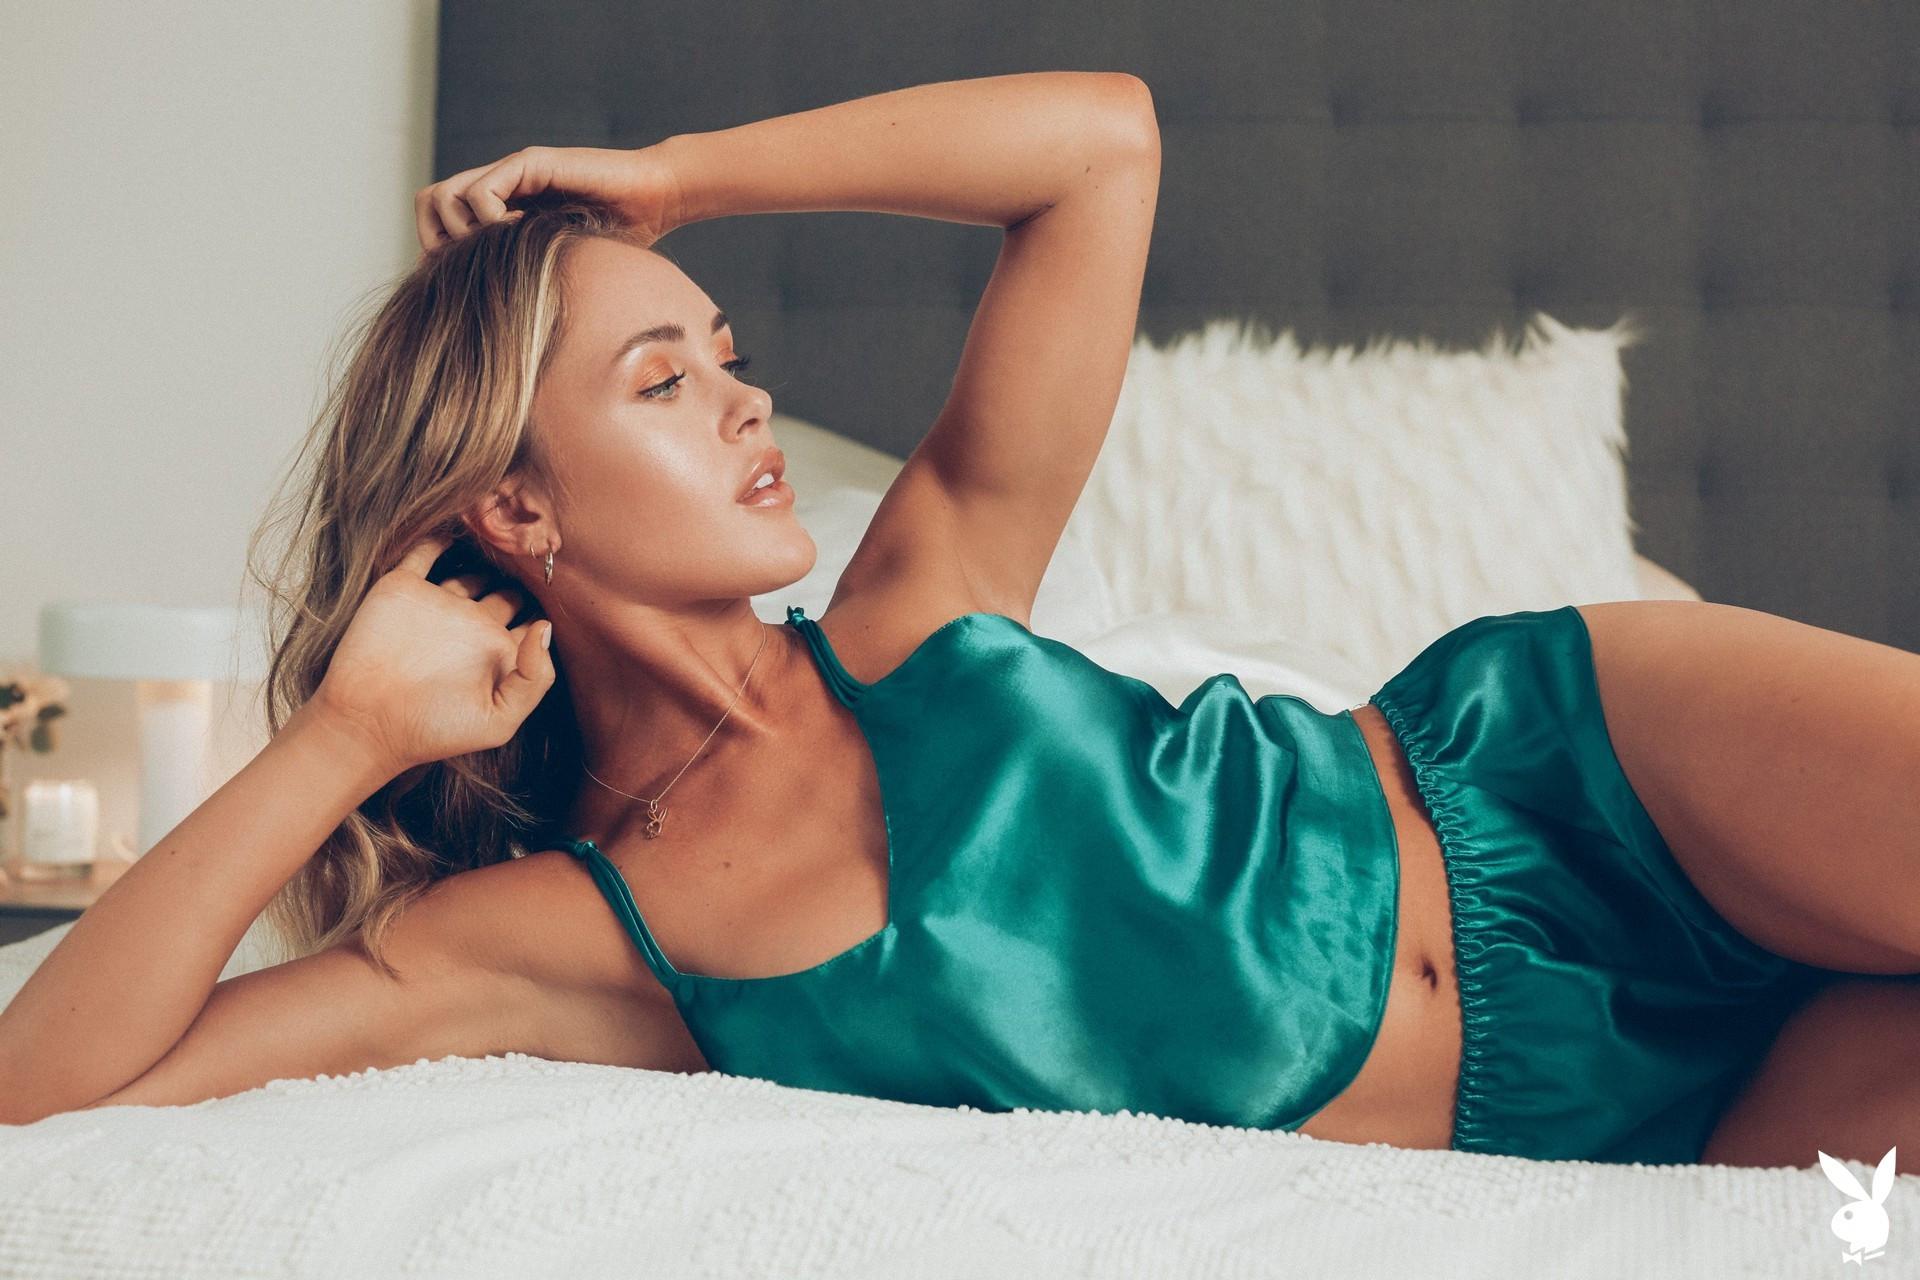 Abigail O'Neill Playmate May 2019 Image00041